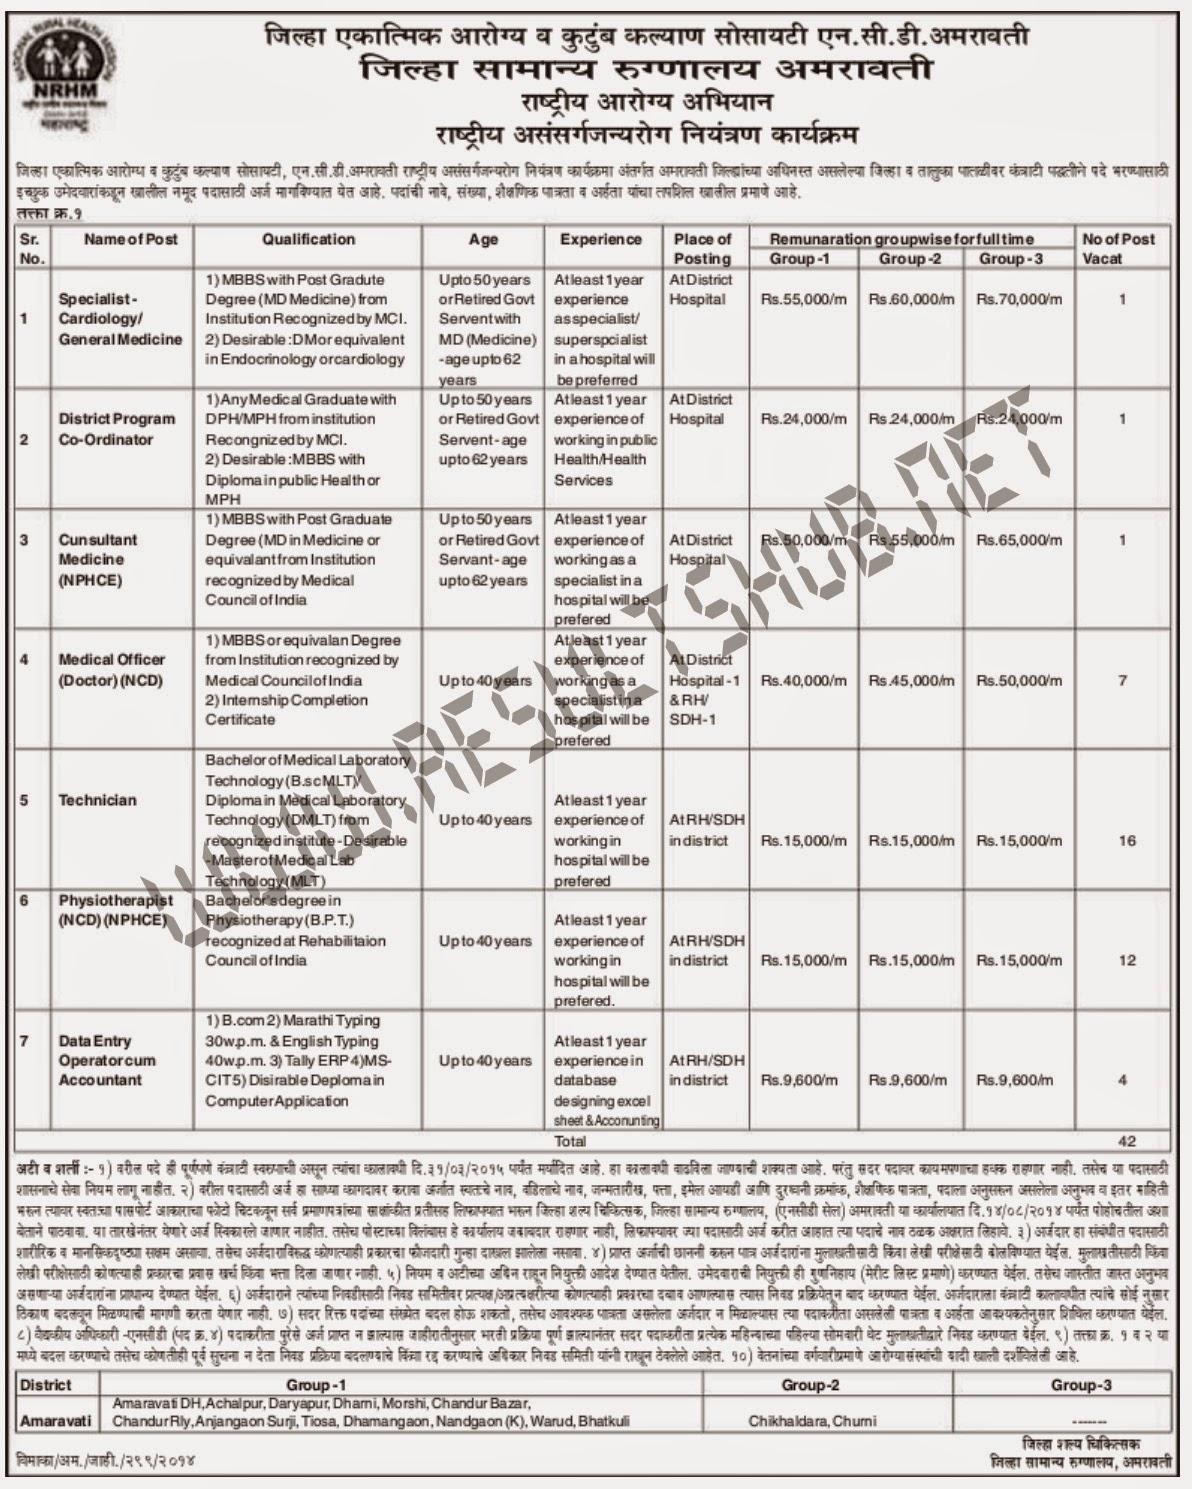 Amravati Zilla Rugnalaya Recruitment 2014 Details